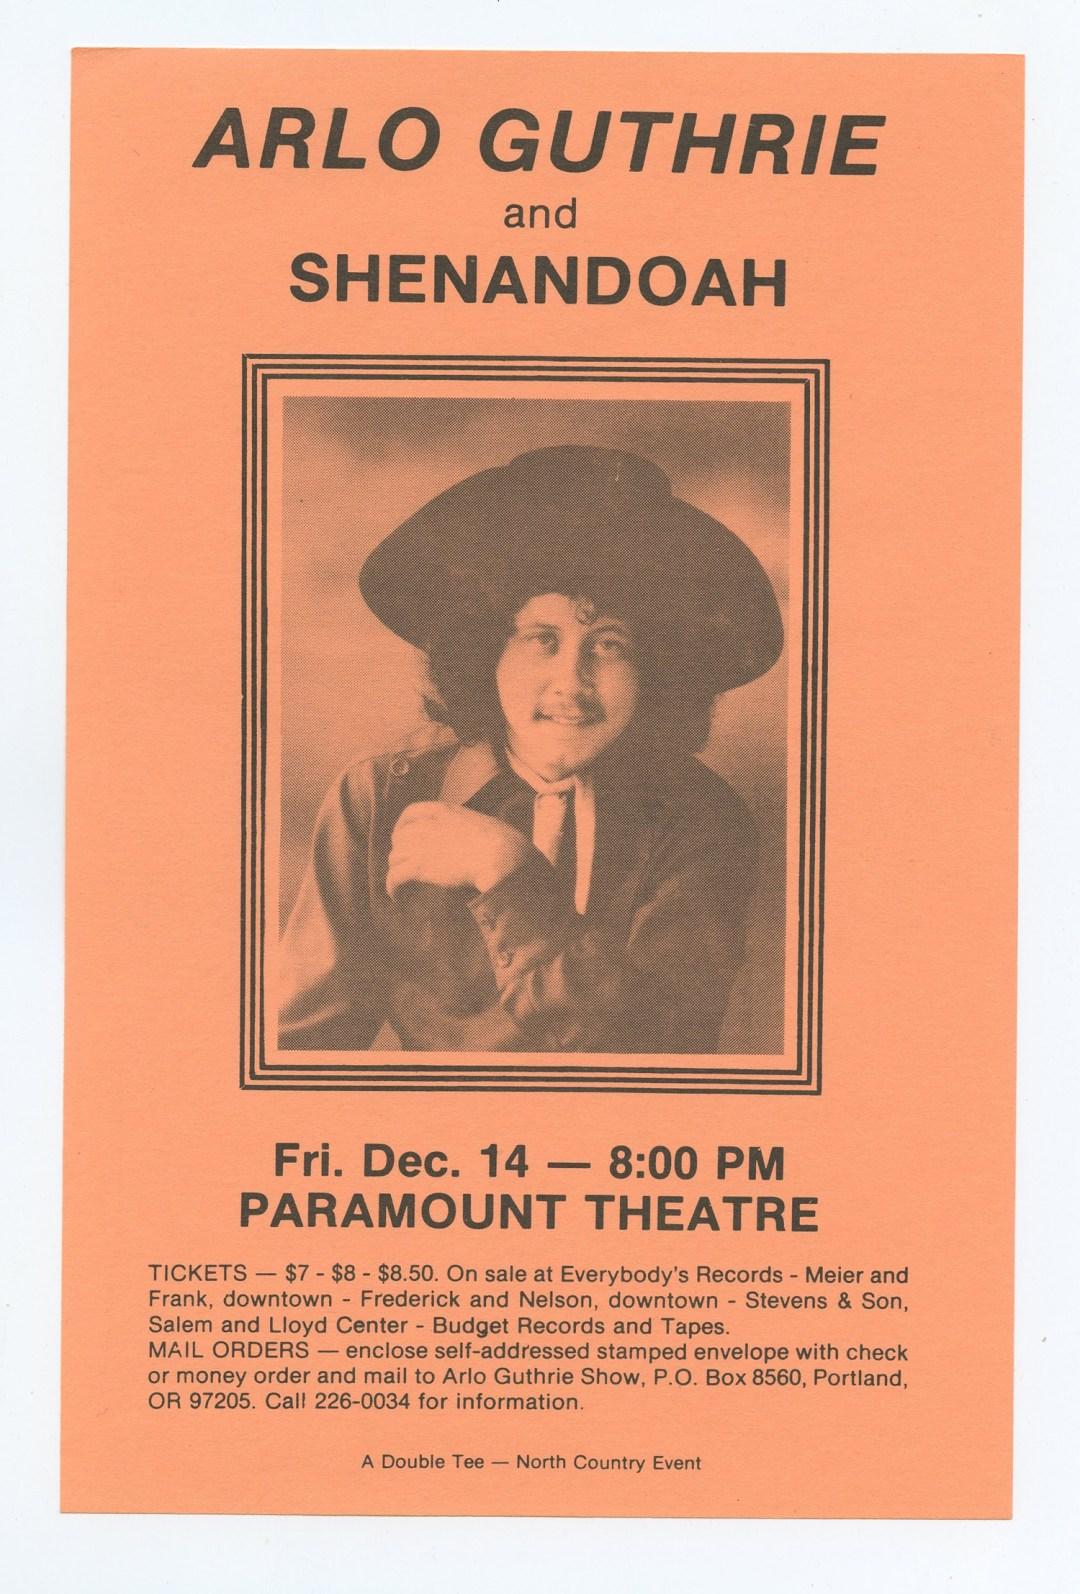 Arlo Guthrie Handbill 1979 Dec 14 Paramount Theater Portland